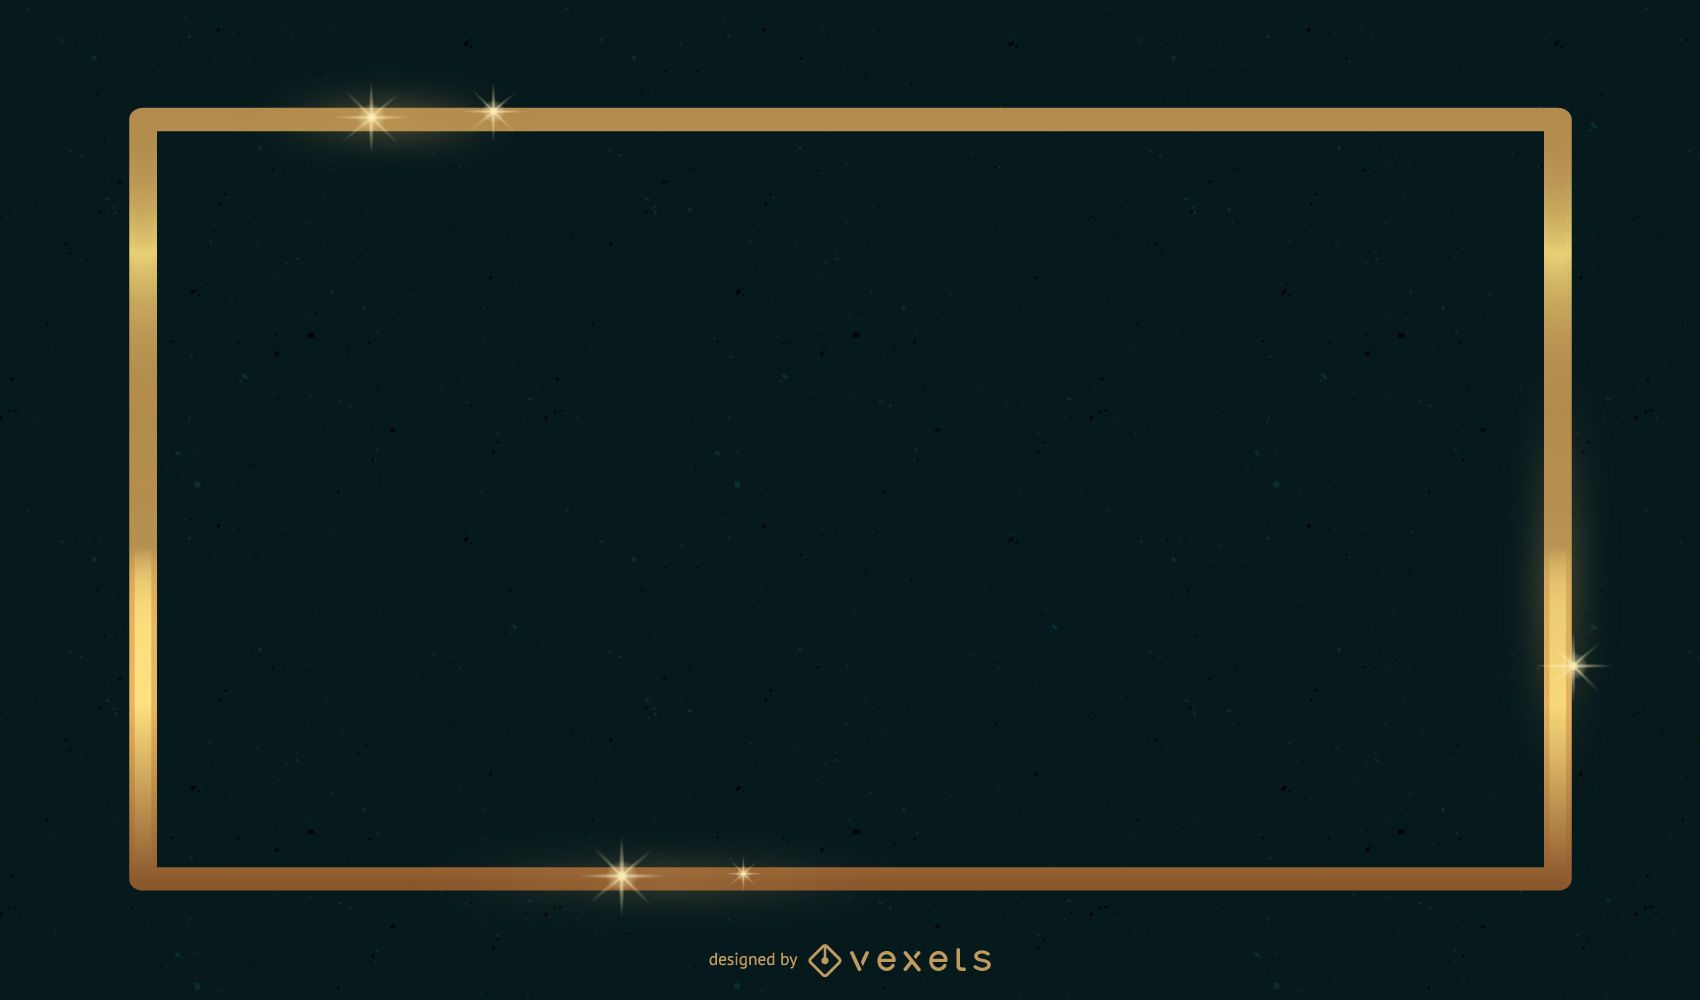 Golden frame for text over green background